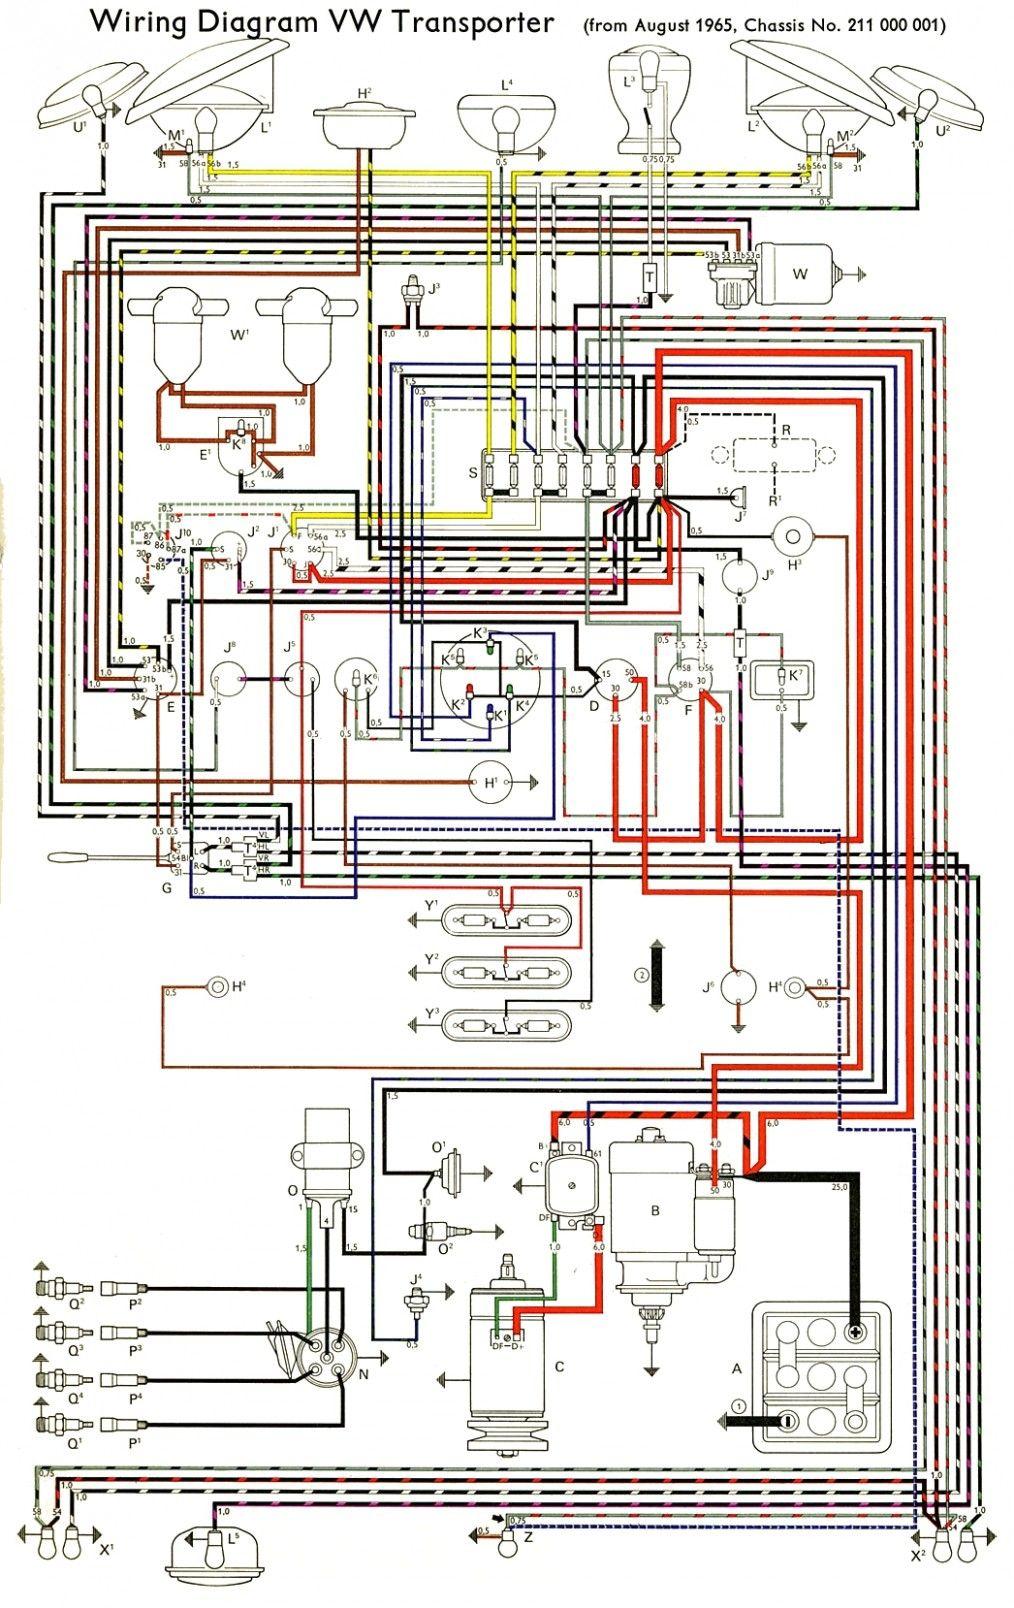 beetle engine diagram engine diagram vw t7 malaysia engine diagram vw t7 malaysia volkswagen beetle engine diagram engine diagram vw t7 malaysia engine